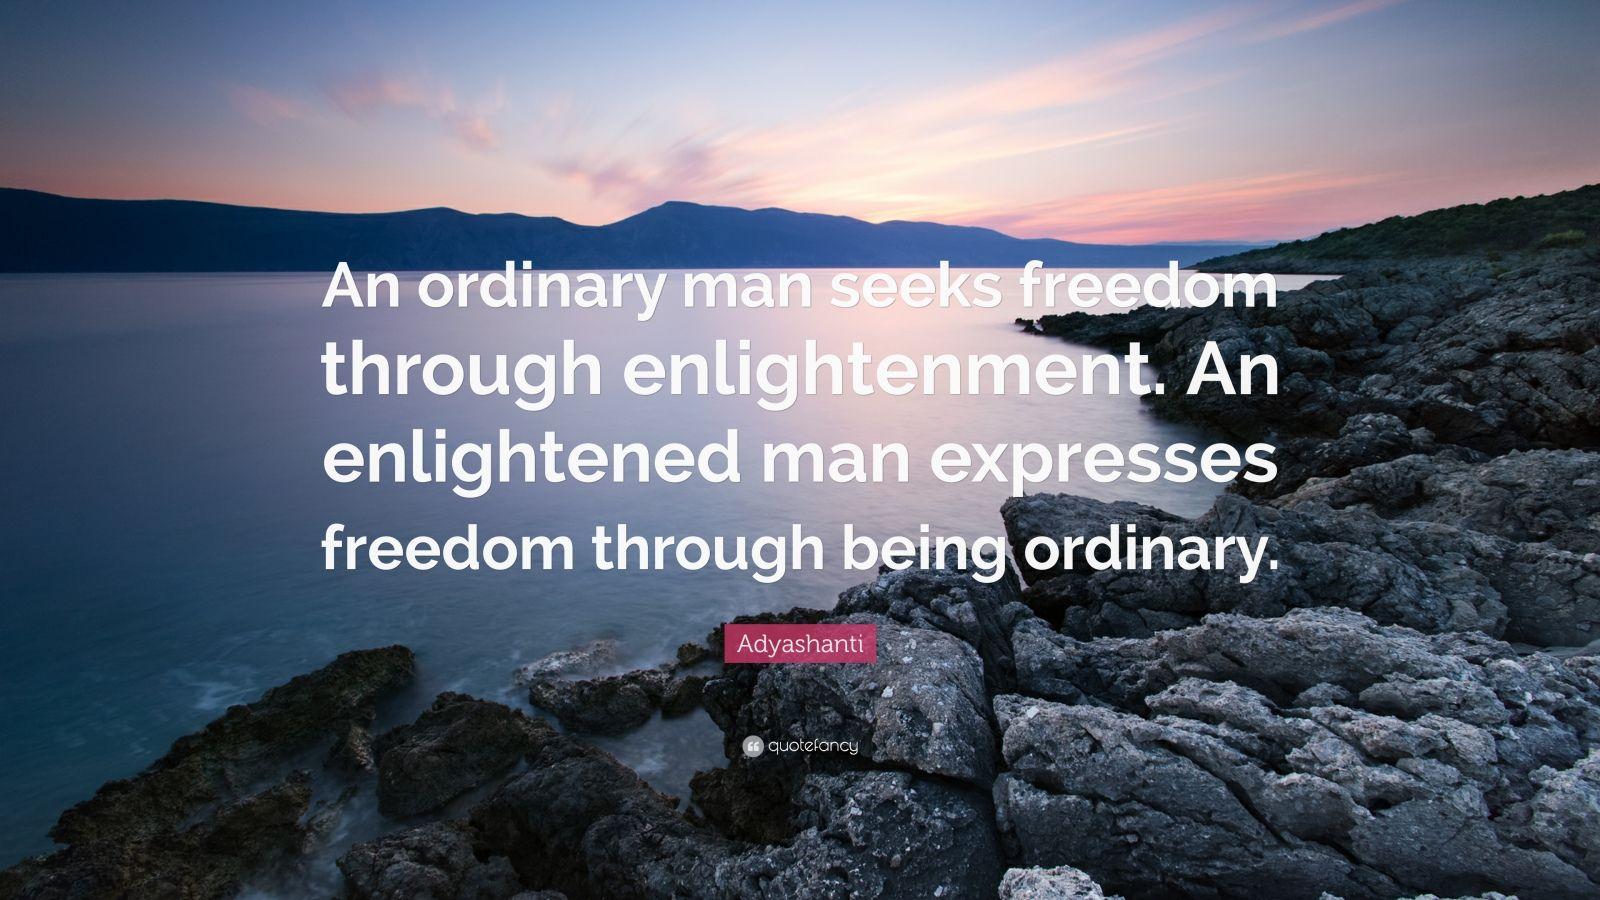 Adyashanti Quotes Adyashanti Quotes 100 Wallpapers  Quotefancy